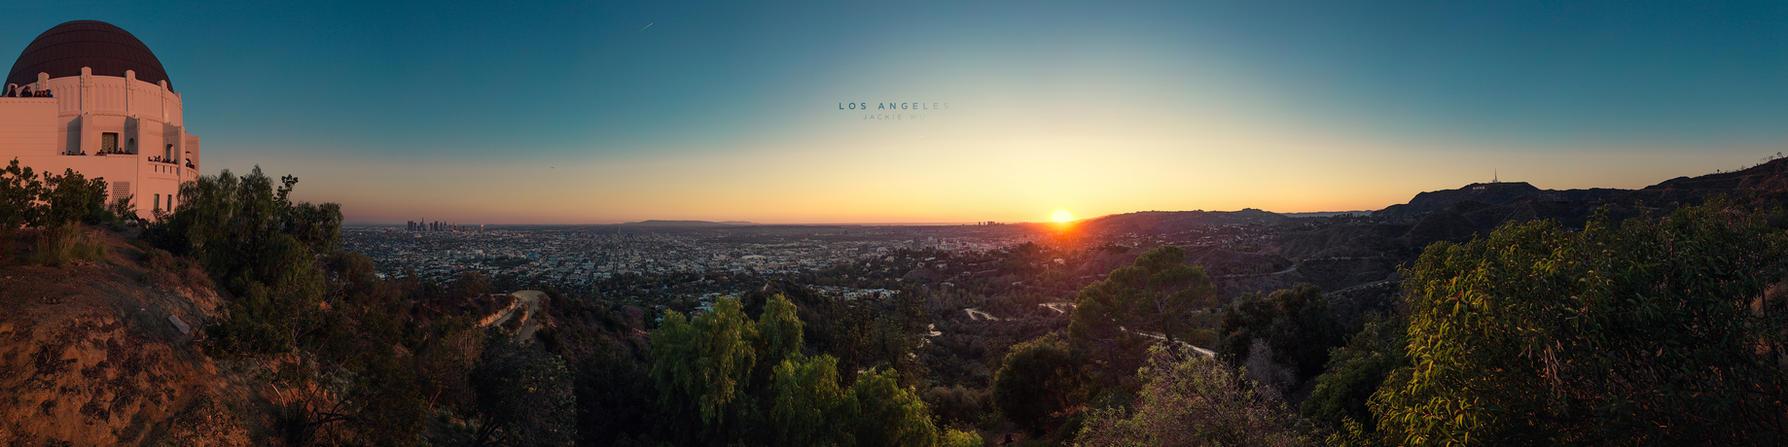 Los Angeles by geckokid